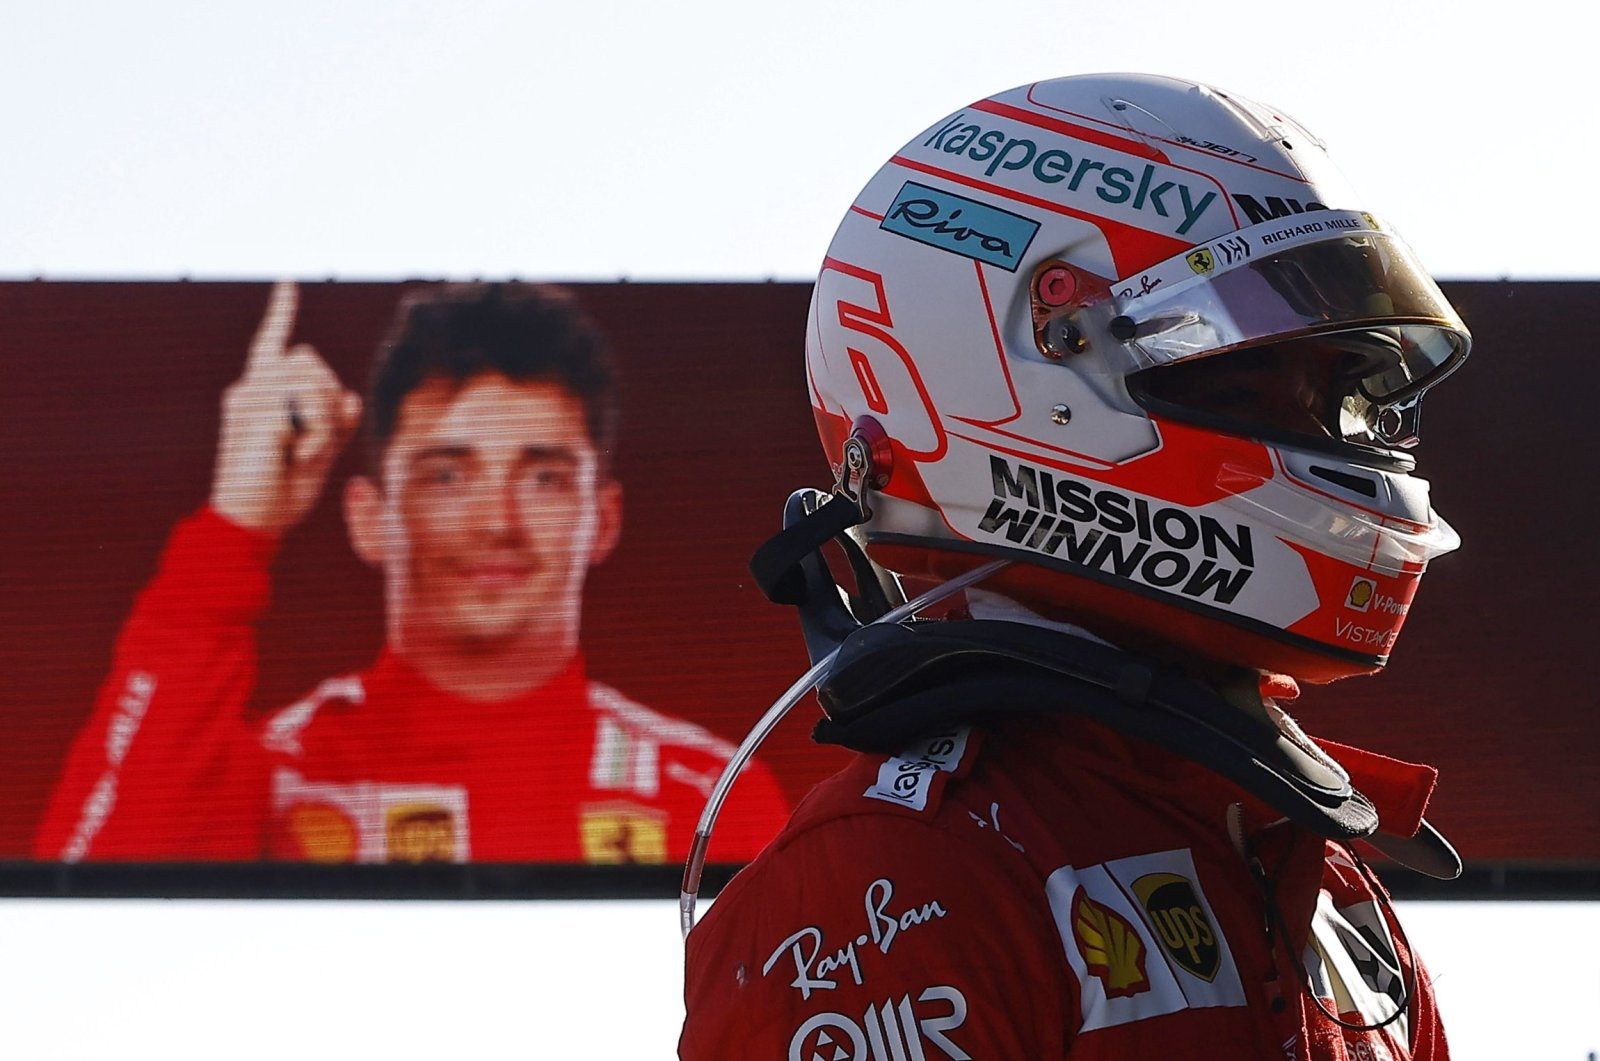 Ferrari's Charles Leclerc after qualifying in pole position in the Azerbaijan Grand Prix, Baku City Circuit, Baku, Azerbaijan, June 5, 2021. (Reuters Photo)